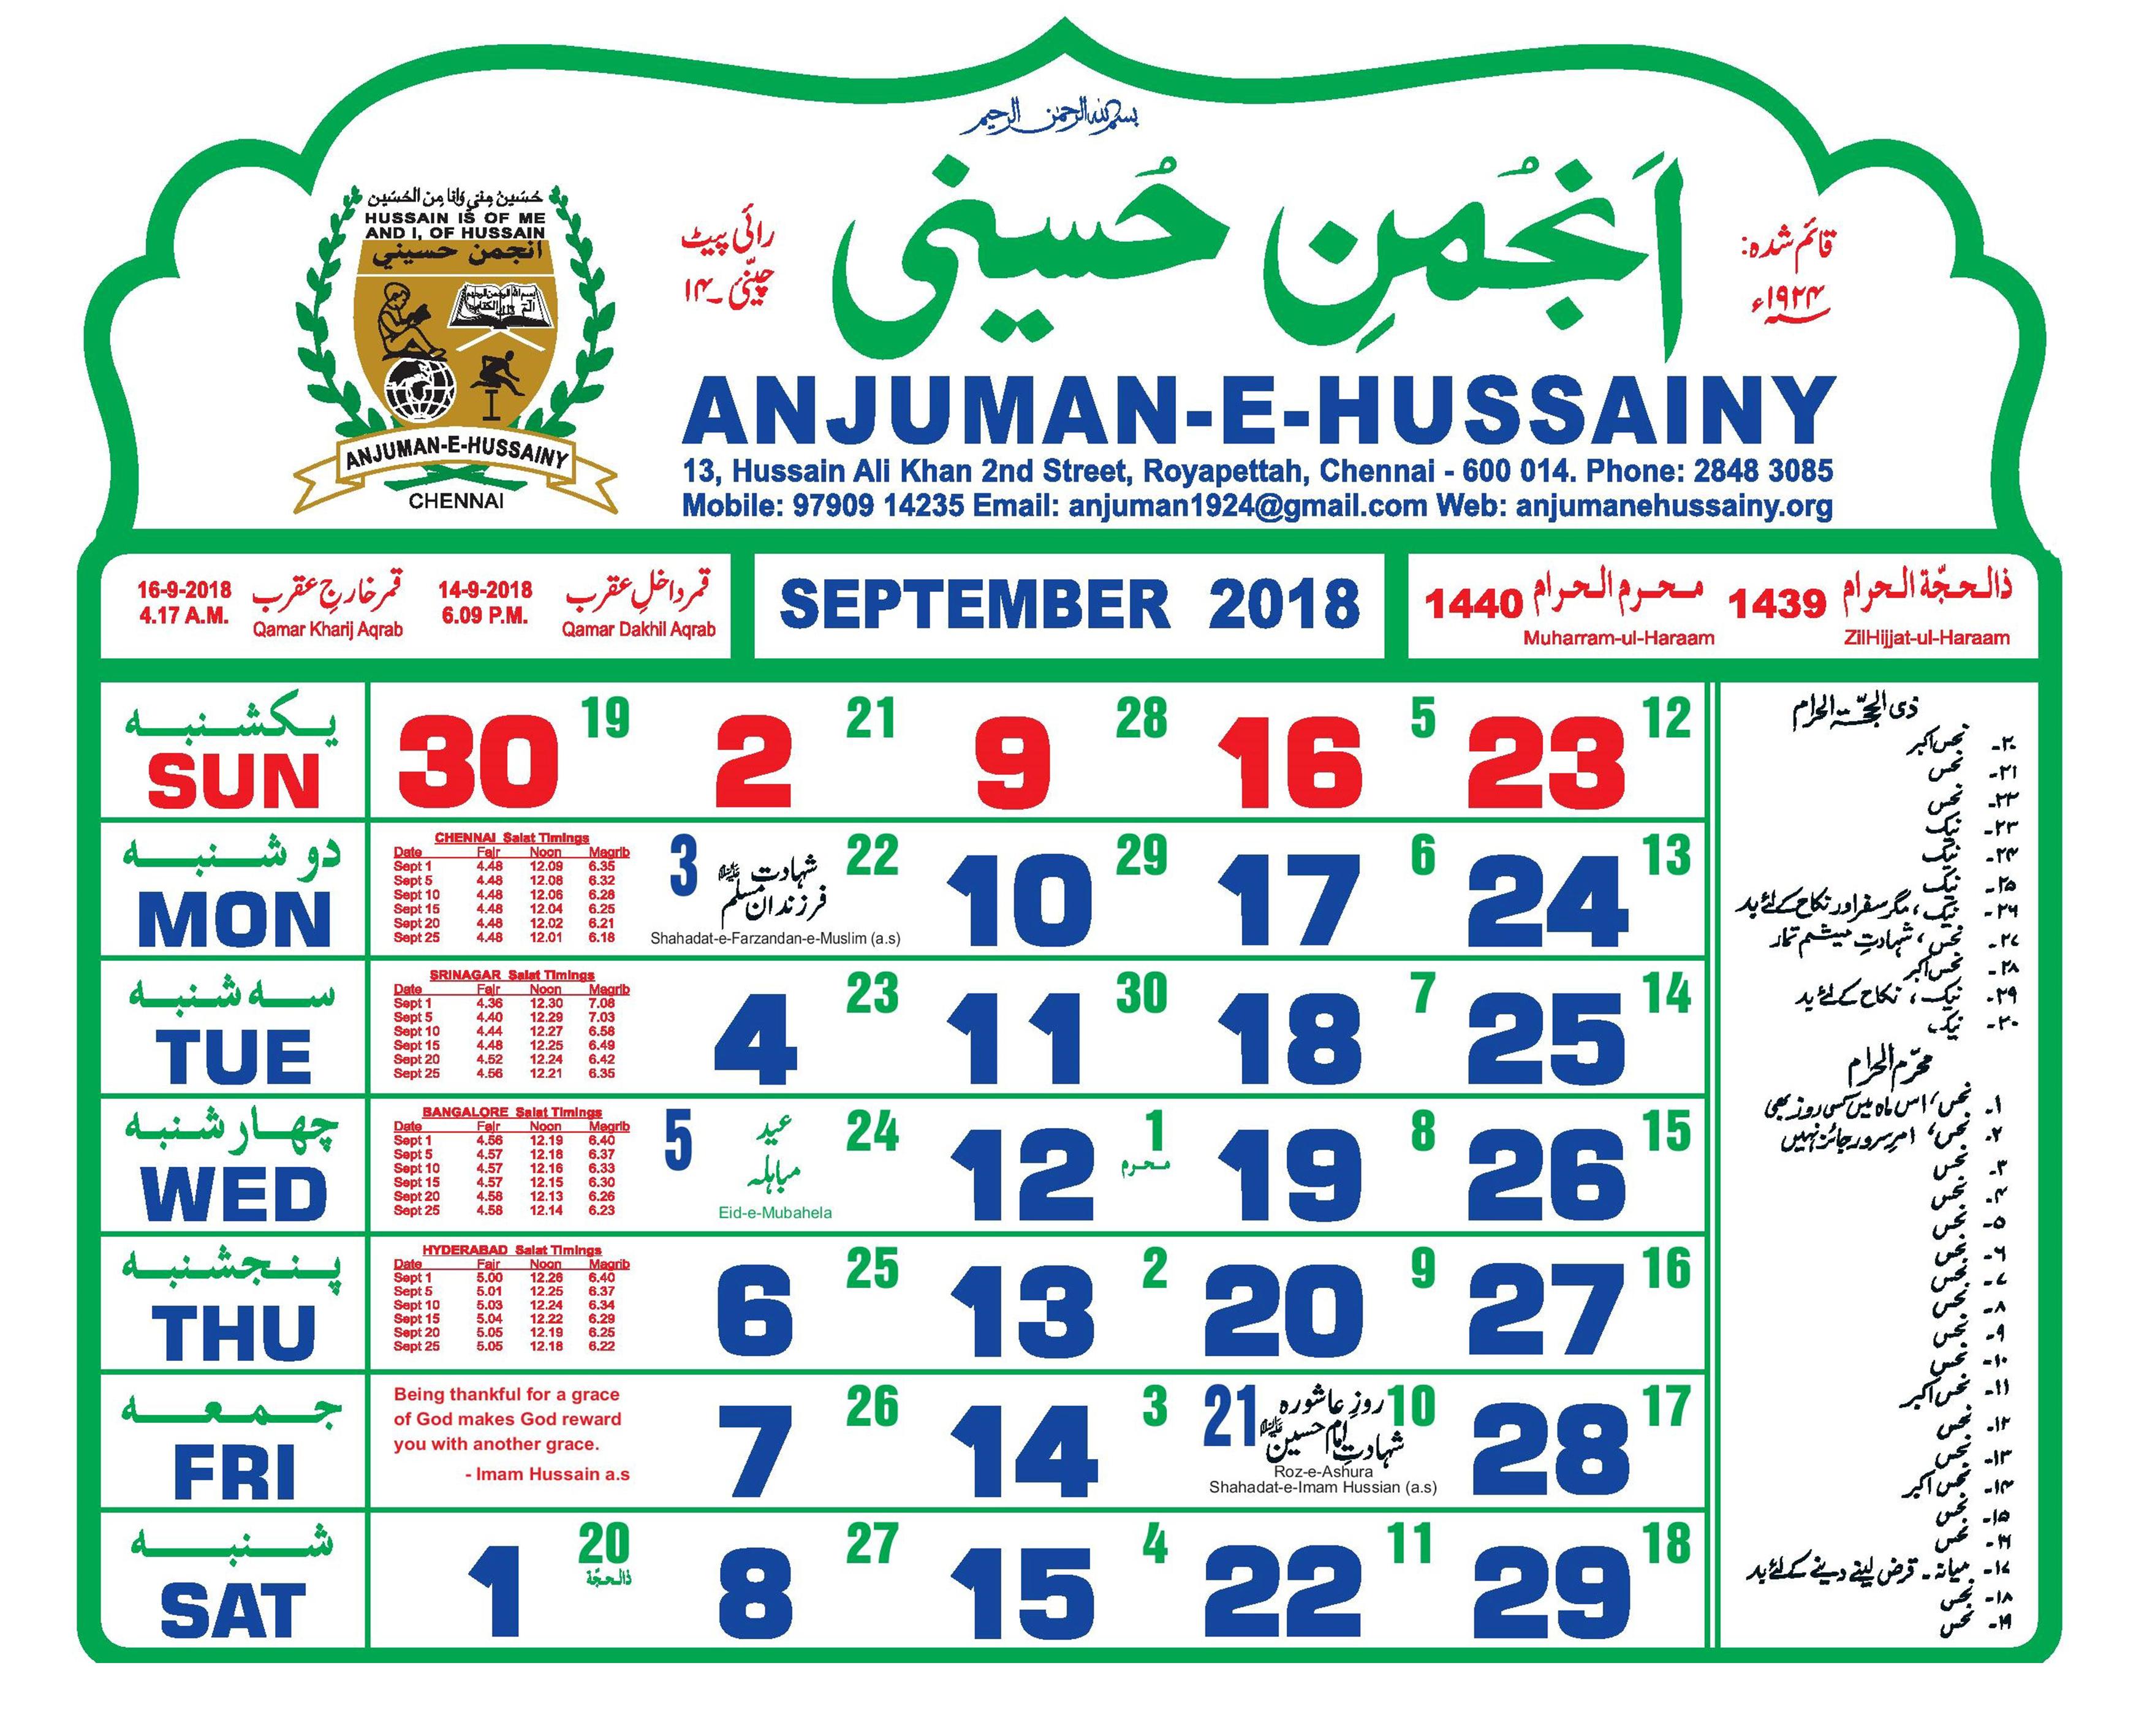 2016 | Anjuman-E-Hussainy